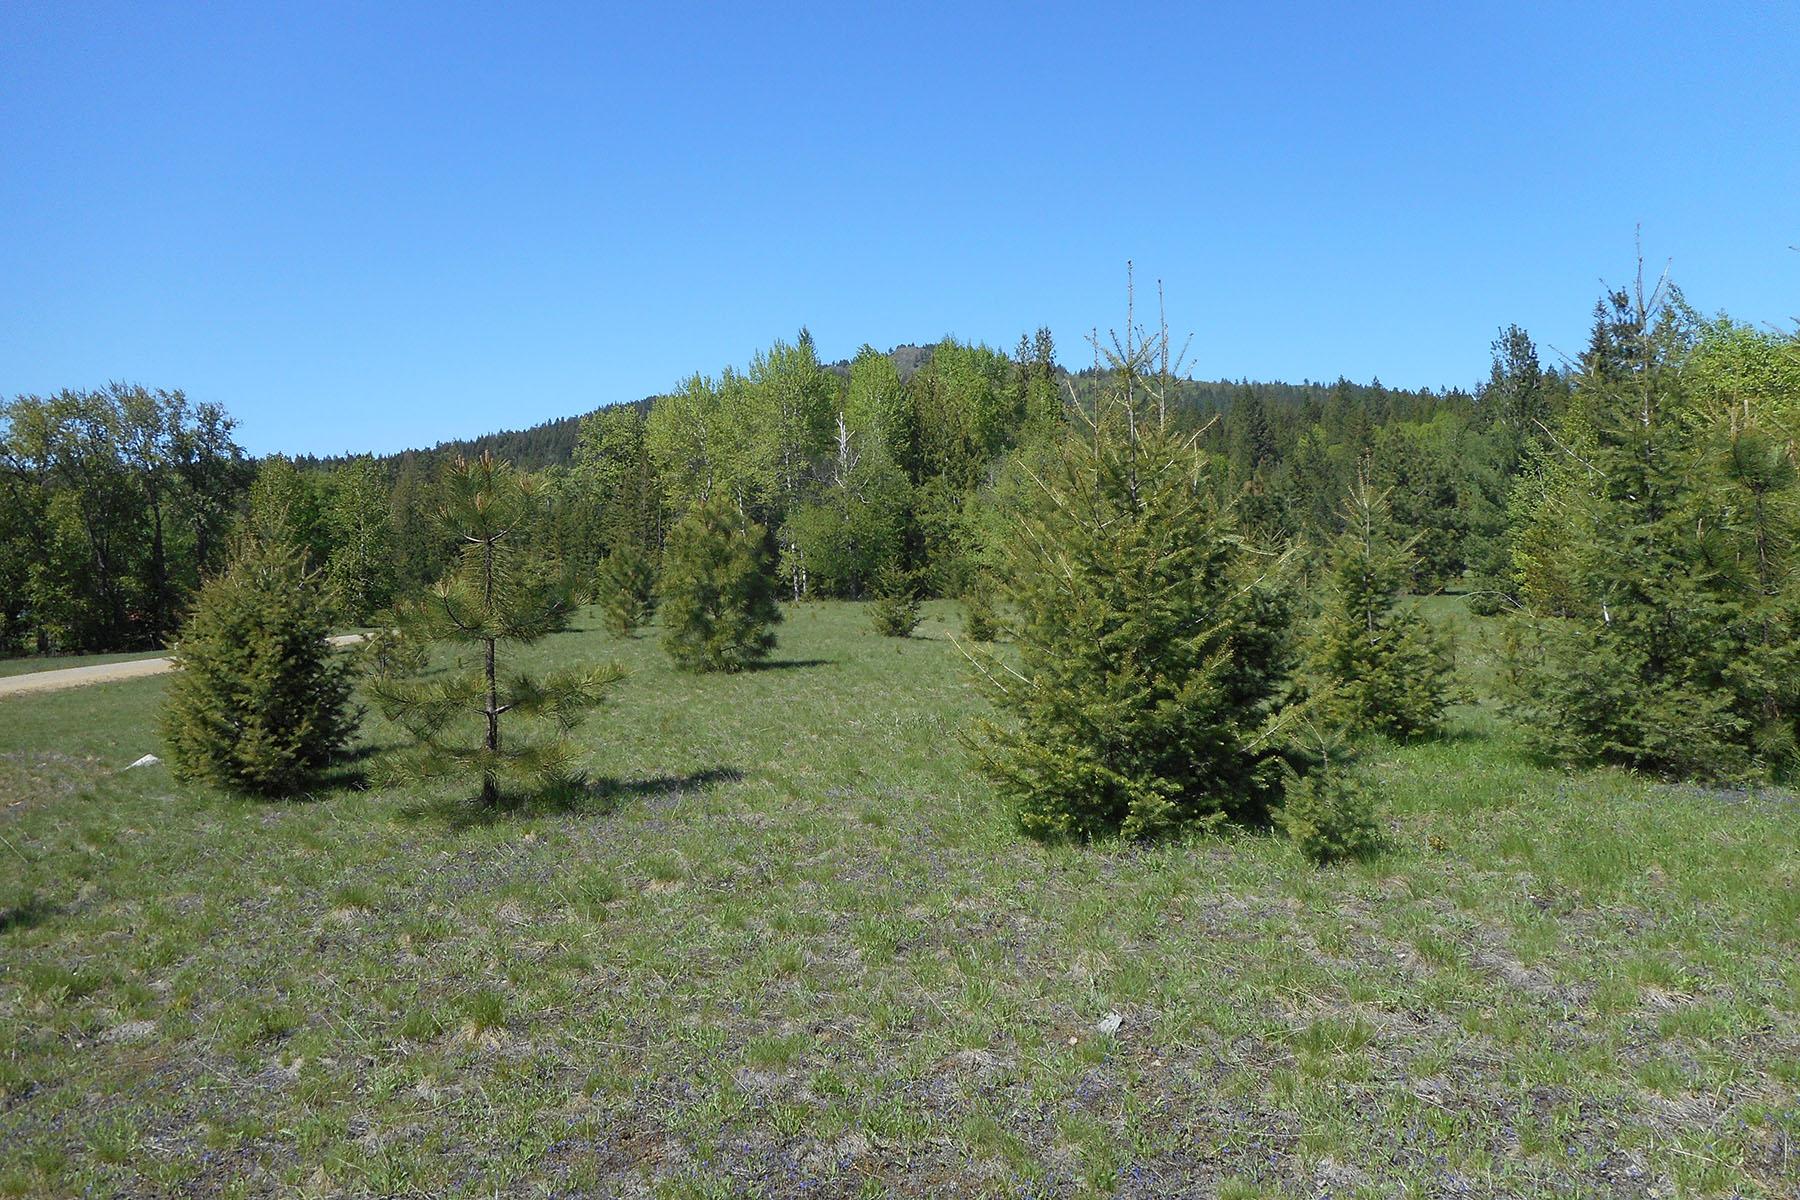 Land for Sale at Pastoral 5 acres on paved road NNA Lot 5 Sagle Road Sagle, Idaho 83860 United States